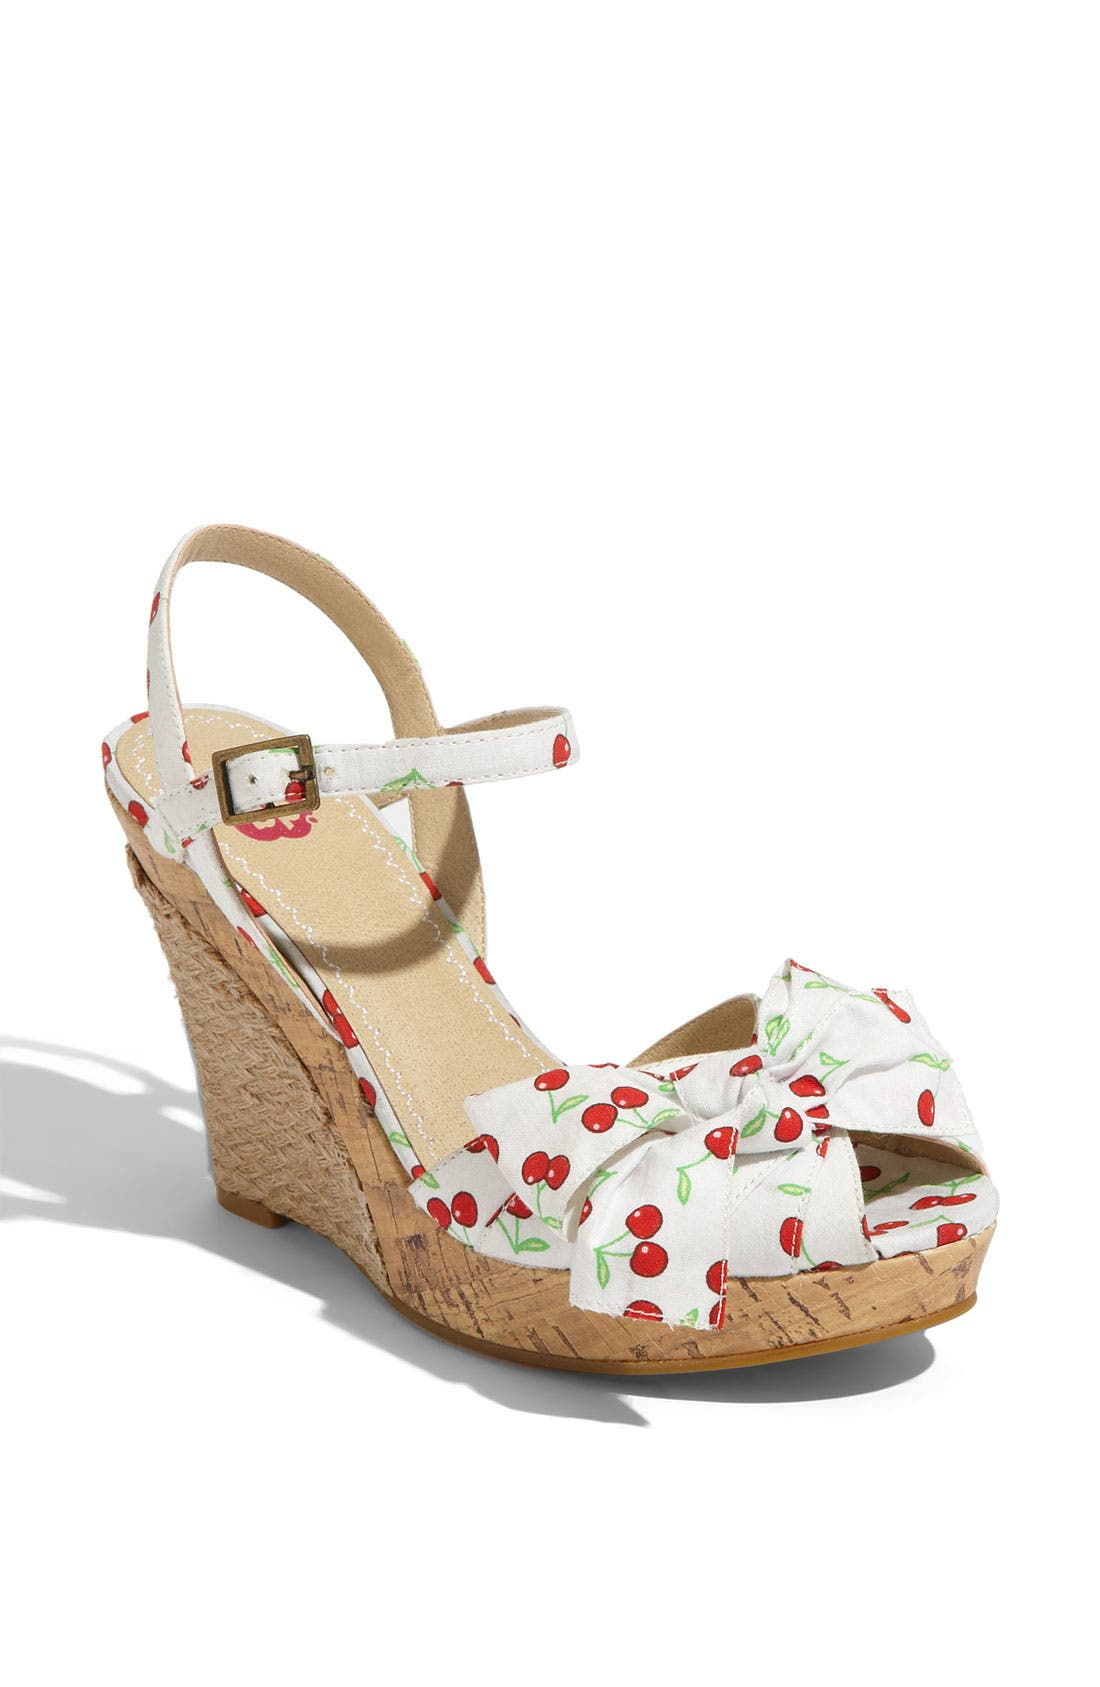 Alternate Image 1 Selected - BP. 'Bowtye' Sandal